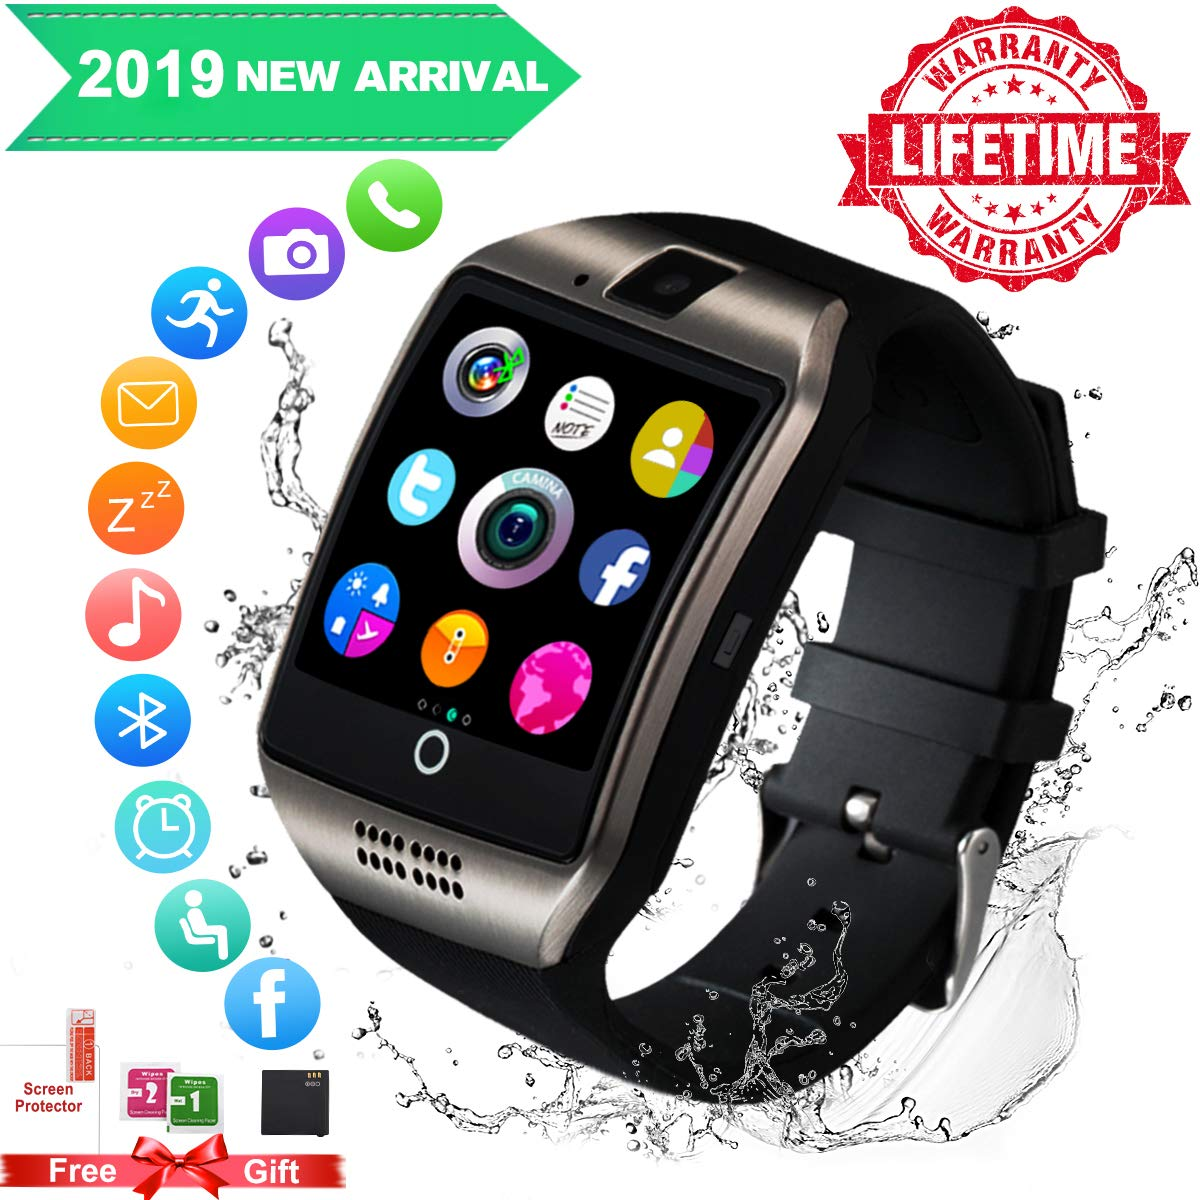 Smartwatch con whatsapp,Bluetooth smart watch Pantalla táctil,Reloj inteligente hombre con Cámara, impermeable… 1